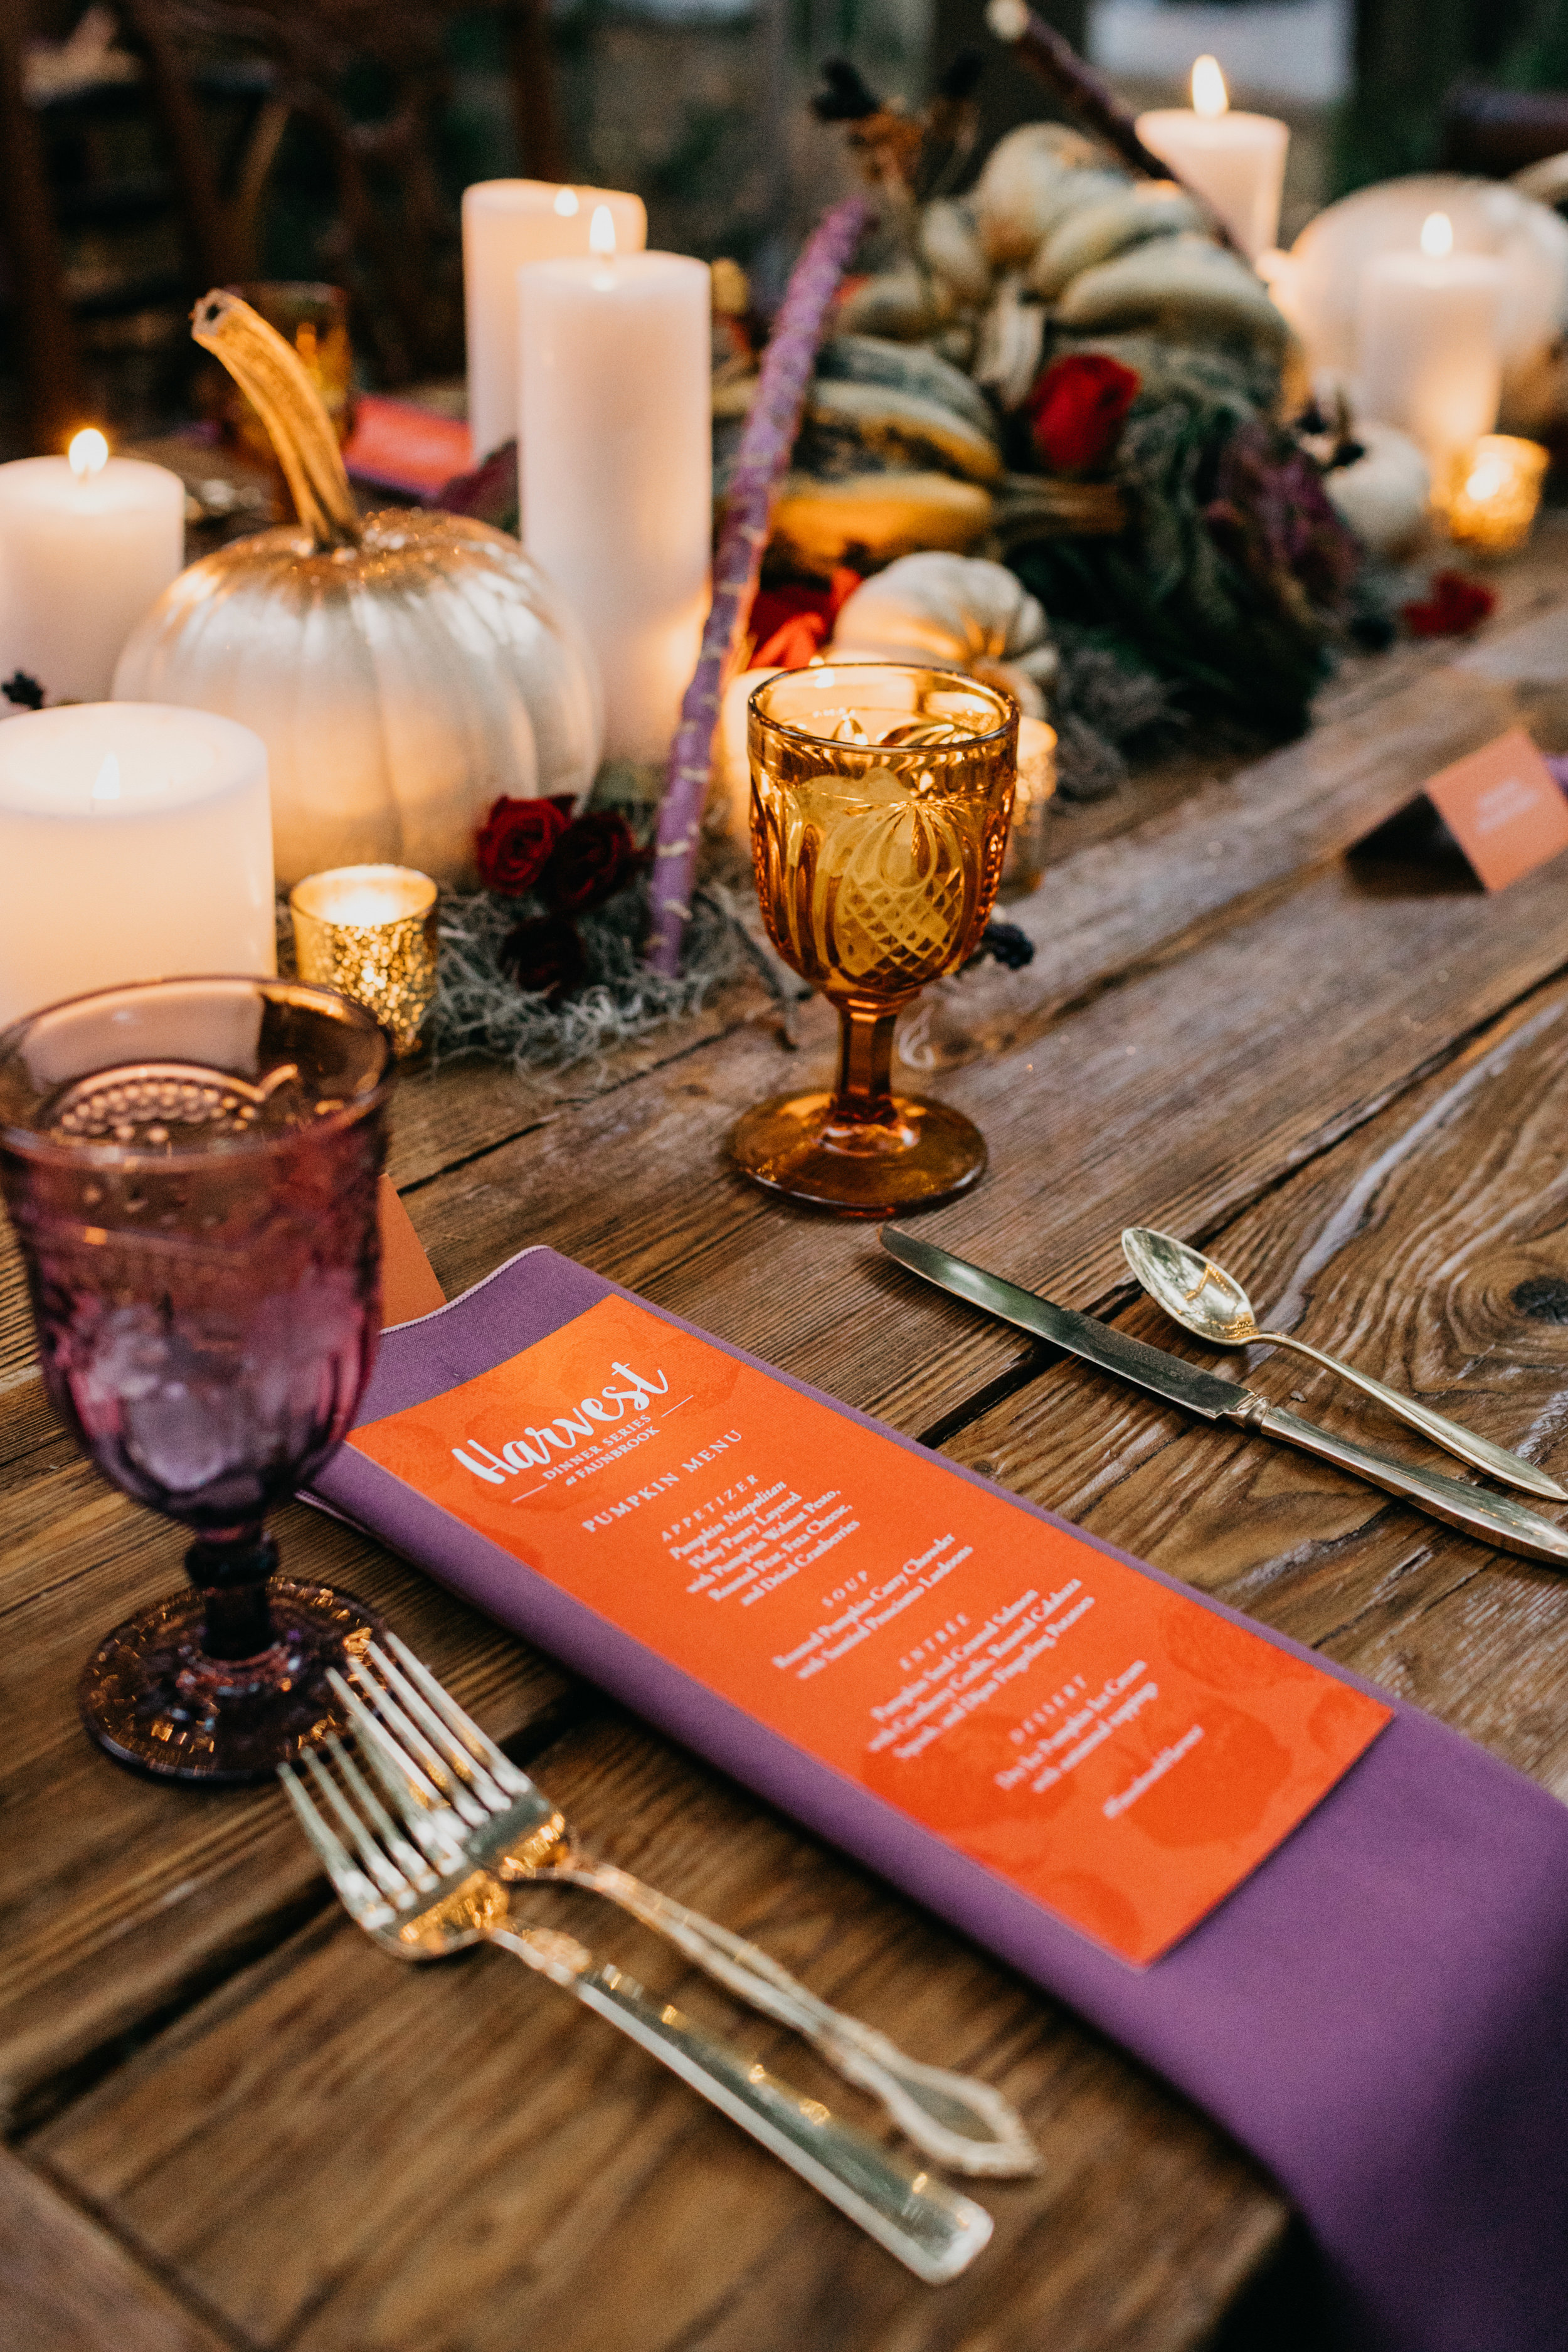 West-Chester-PA-Faunbrook-Harvest-Dinner-Series-Pumpkin-JustinJohnson-66.jpg